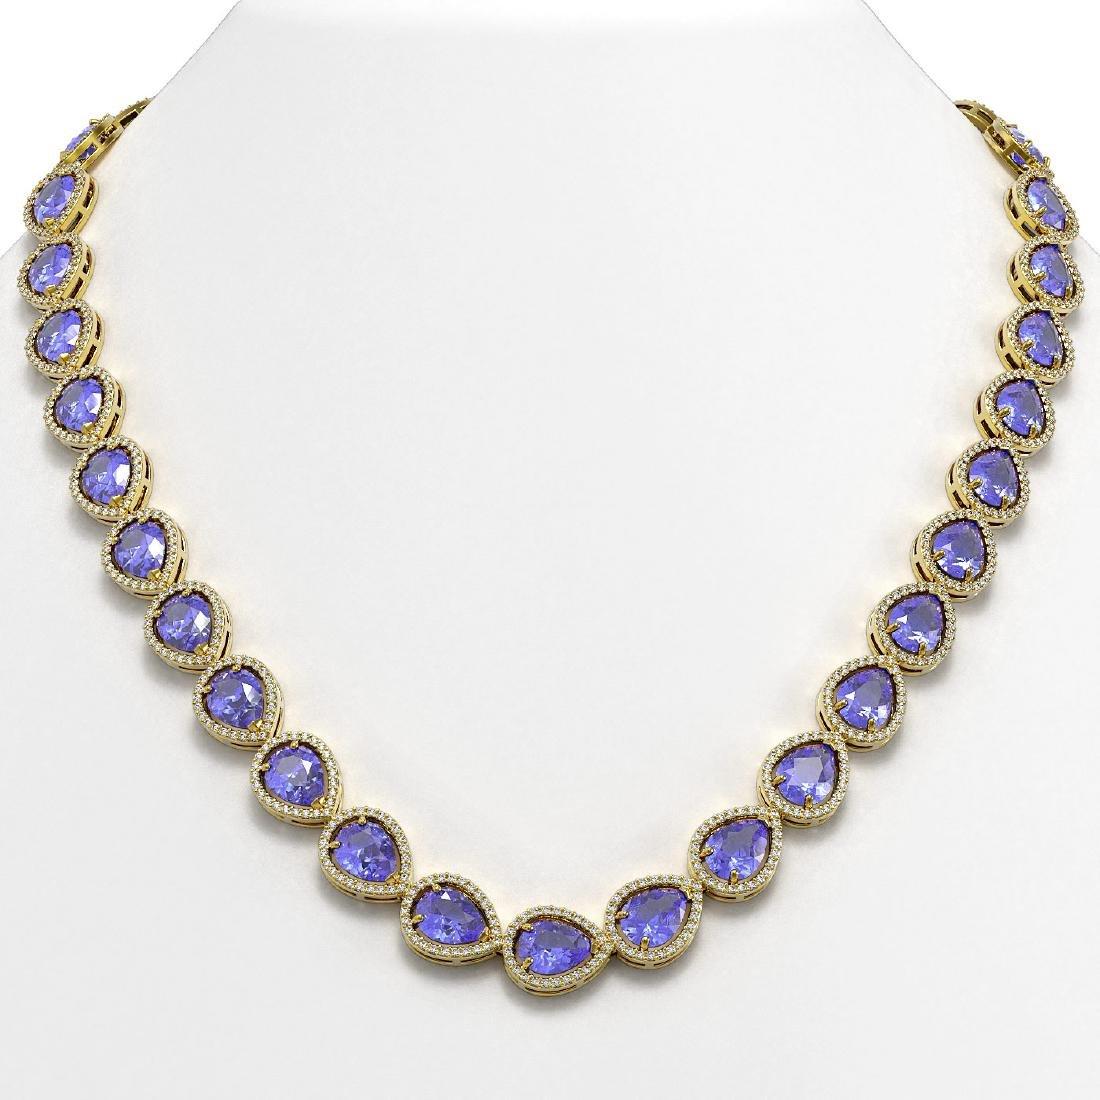 44.8 CTW Tanzanite & Diamond Halo Necklace 10K Yellow